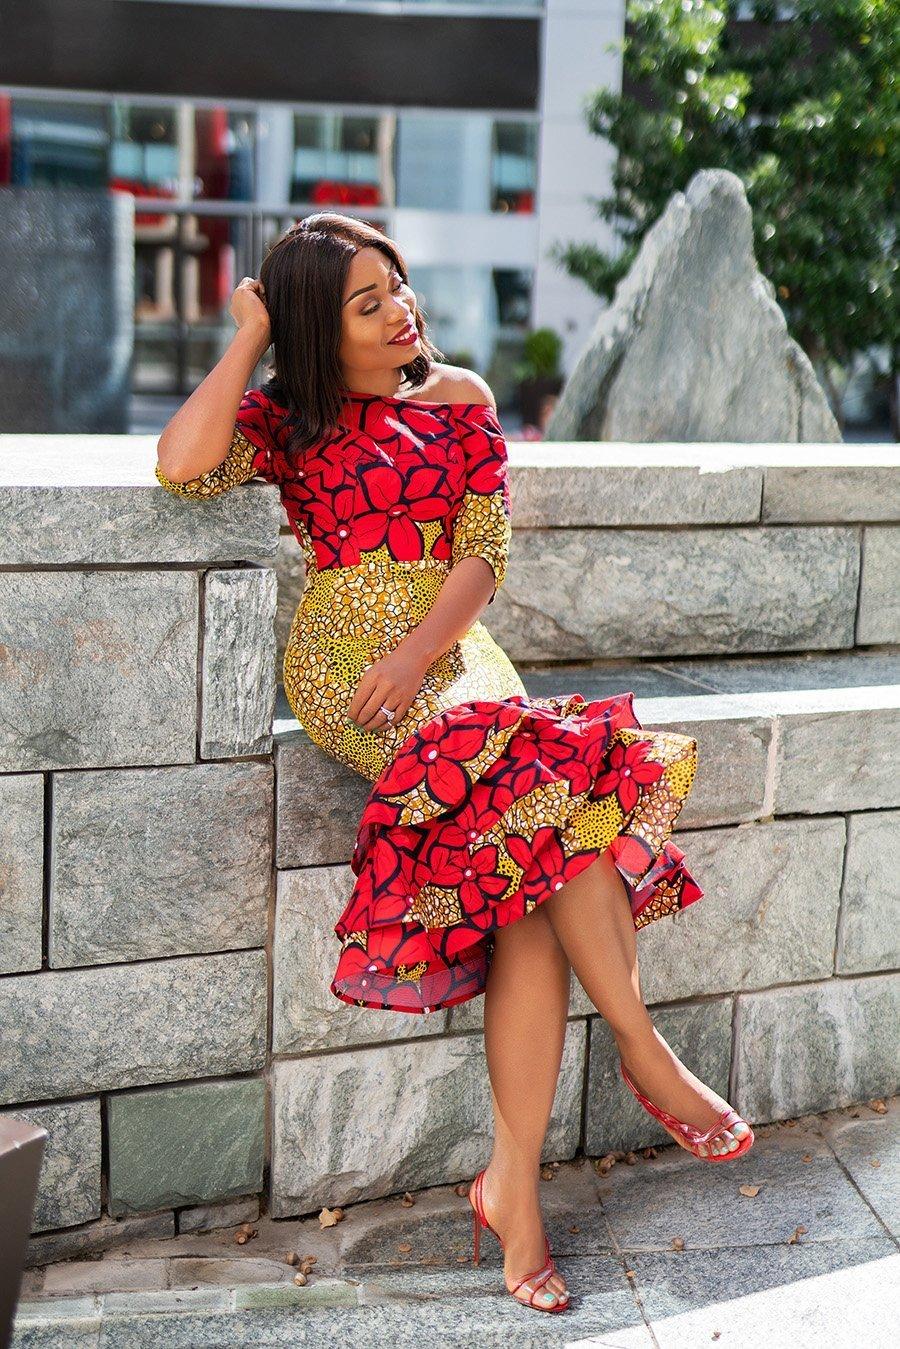 Stella-Adewunmi-of-Jadore-Fashion-shares-her-ankara-print-dress